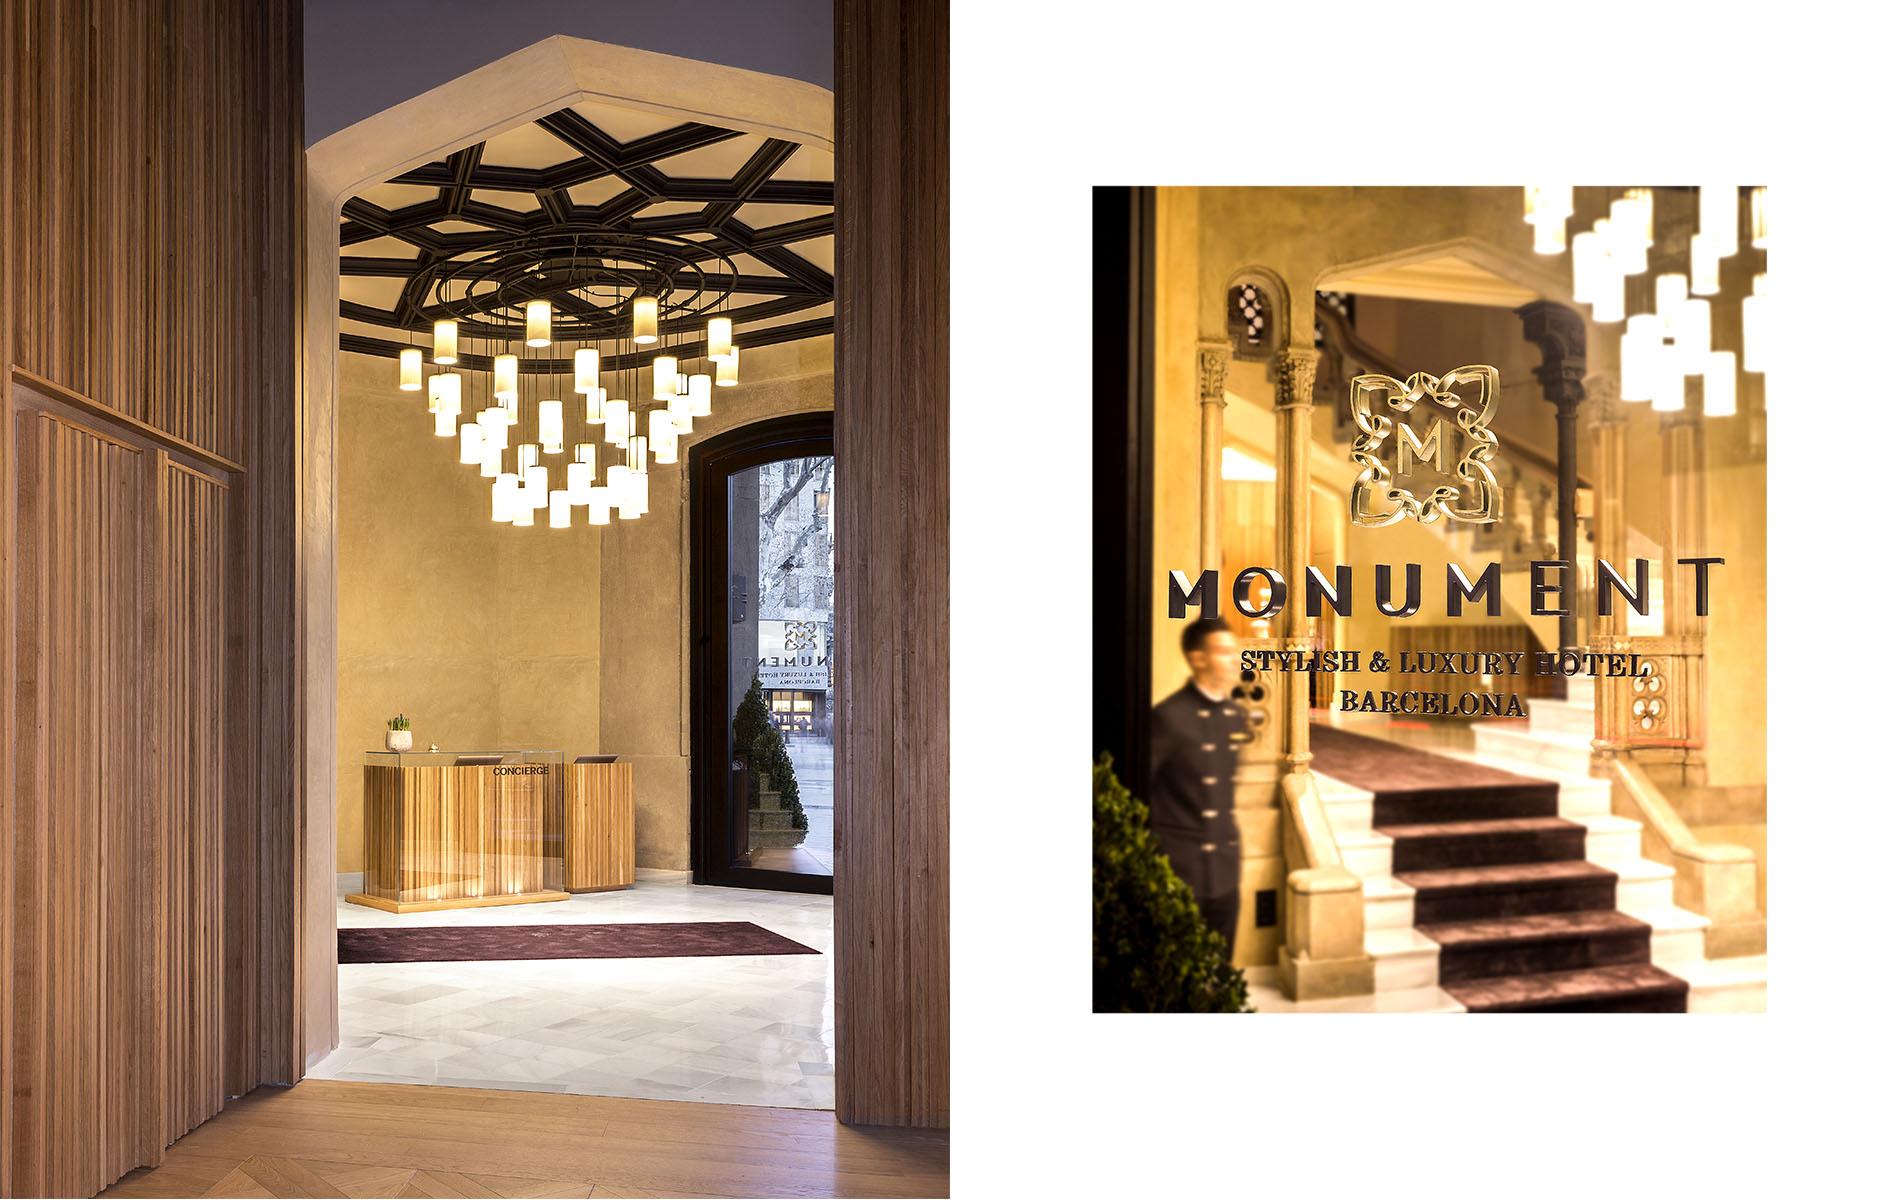 interior hotel ,interior design , design barcelona ,rafaelvargasphoto,merce borrel,monument hotel